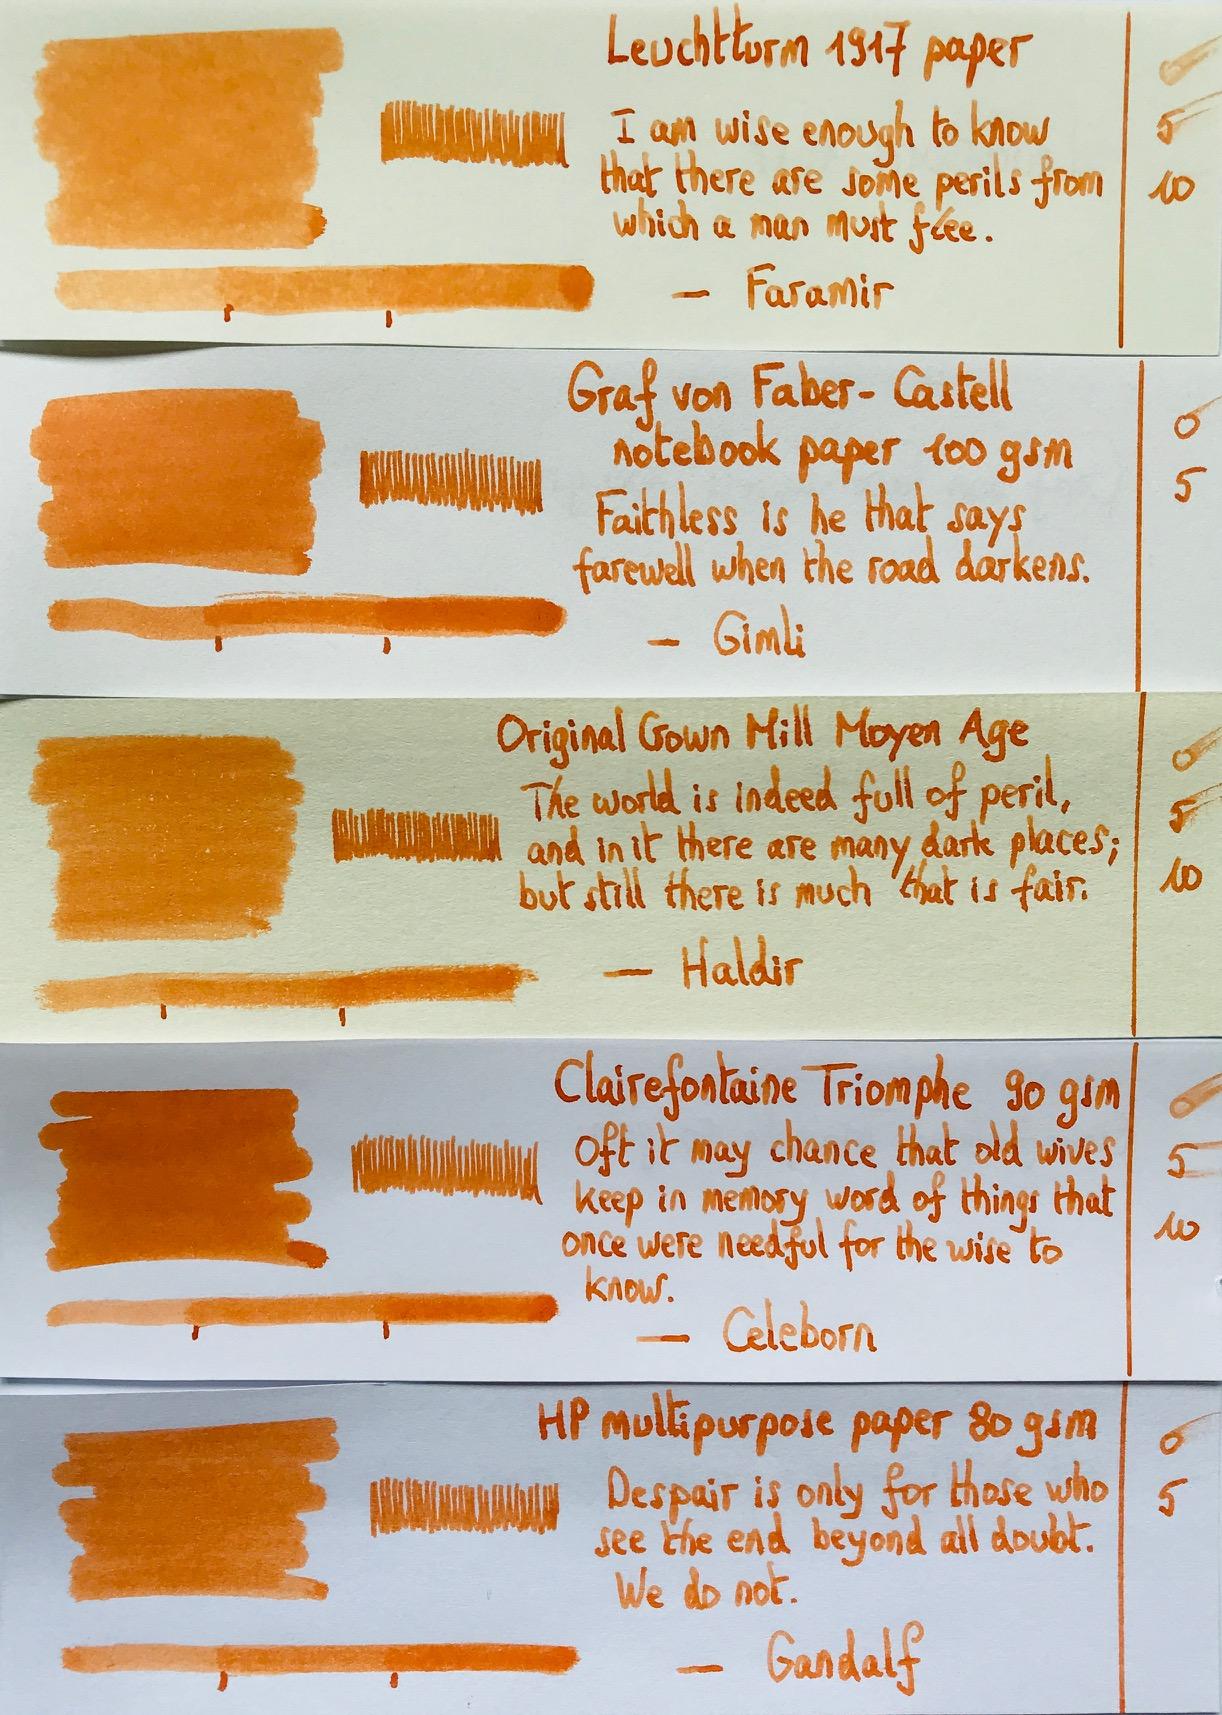 fpn_1565879718__j_herbin_-_orange_indien